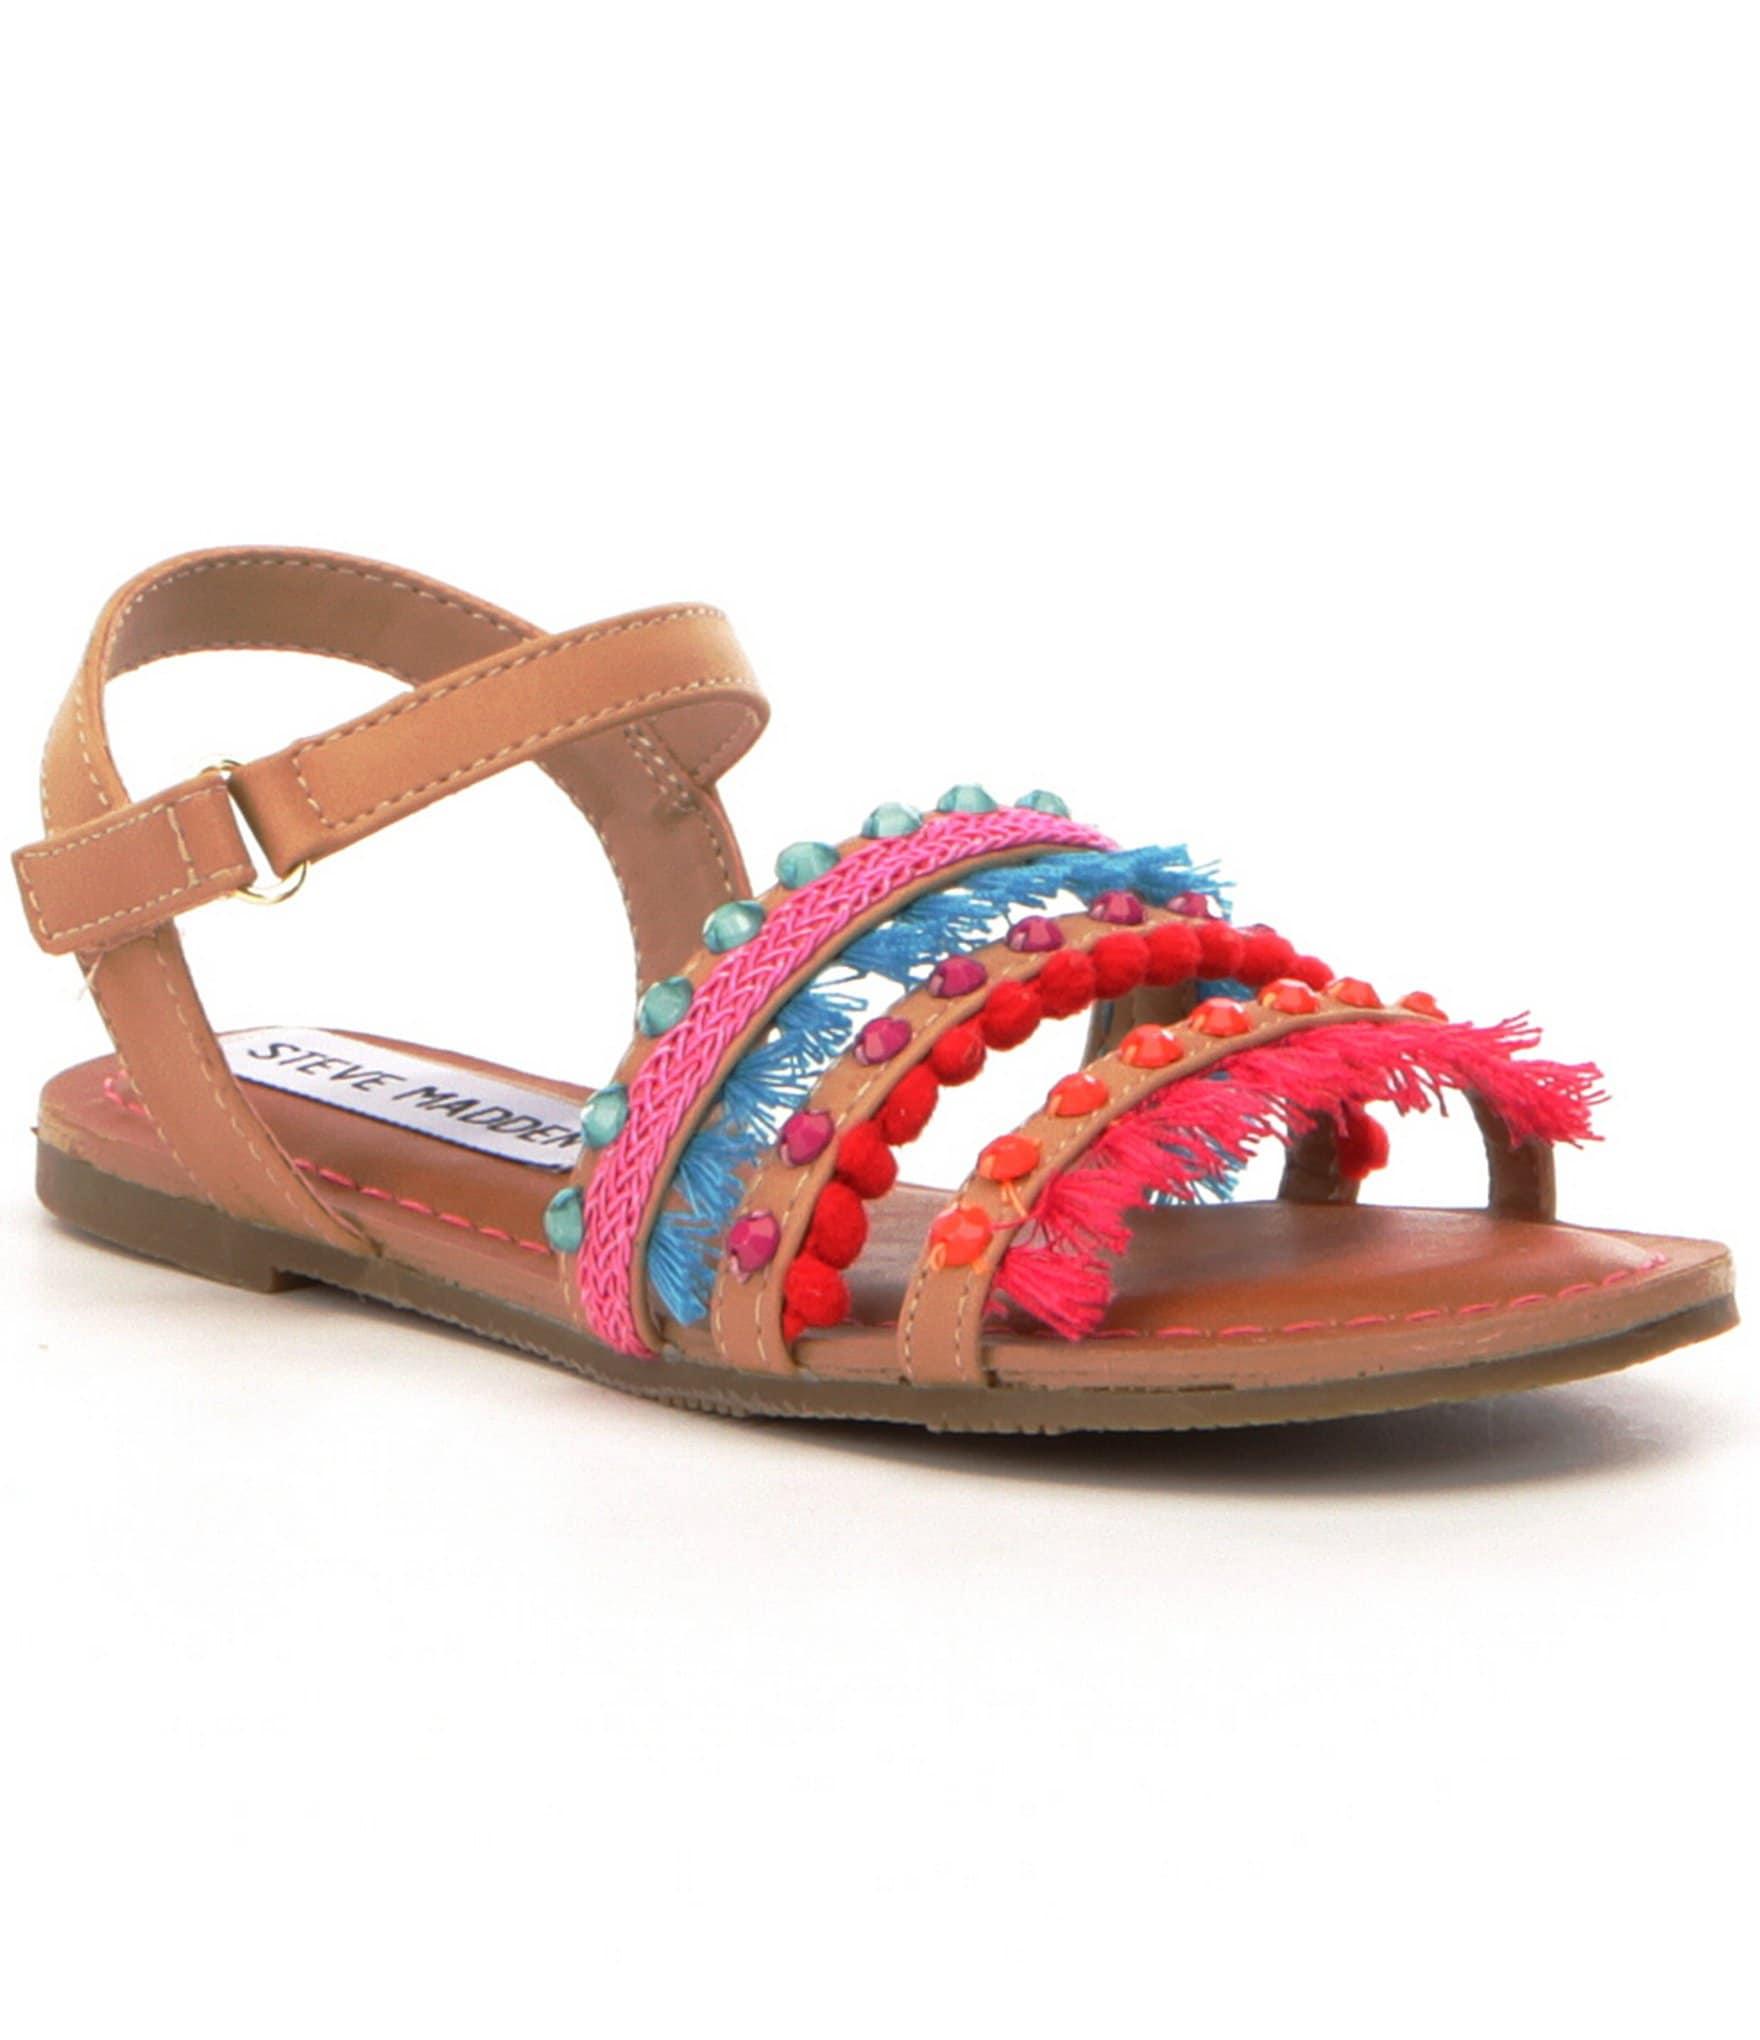 Toddler Size   Pom Pom Shoes